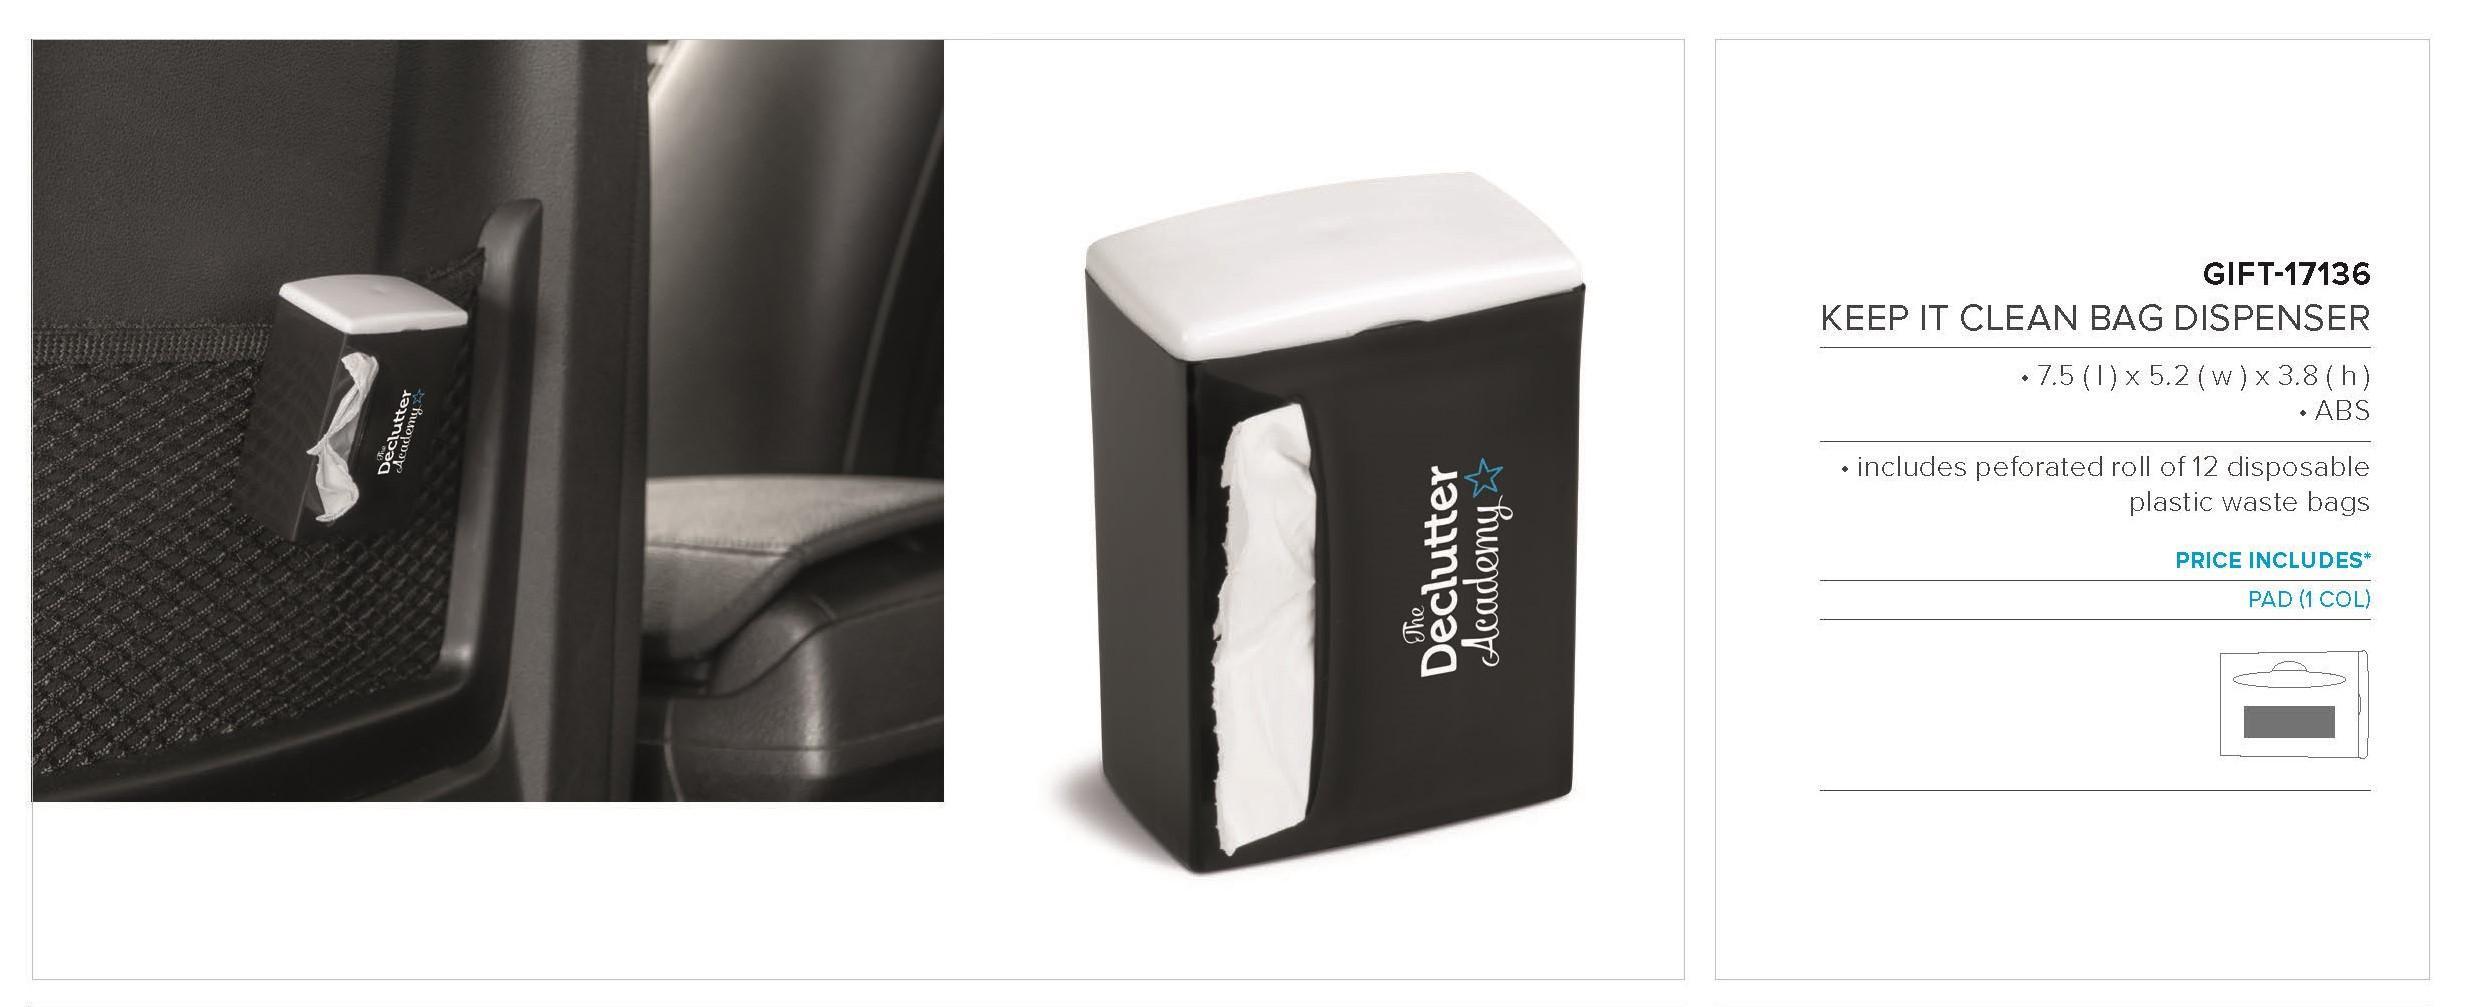 Keep It Clean Bag Dispenser - Black Only